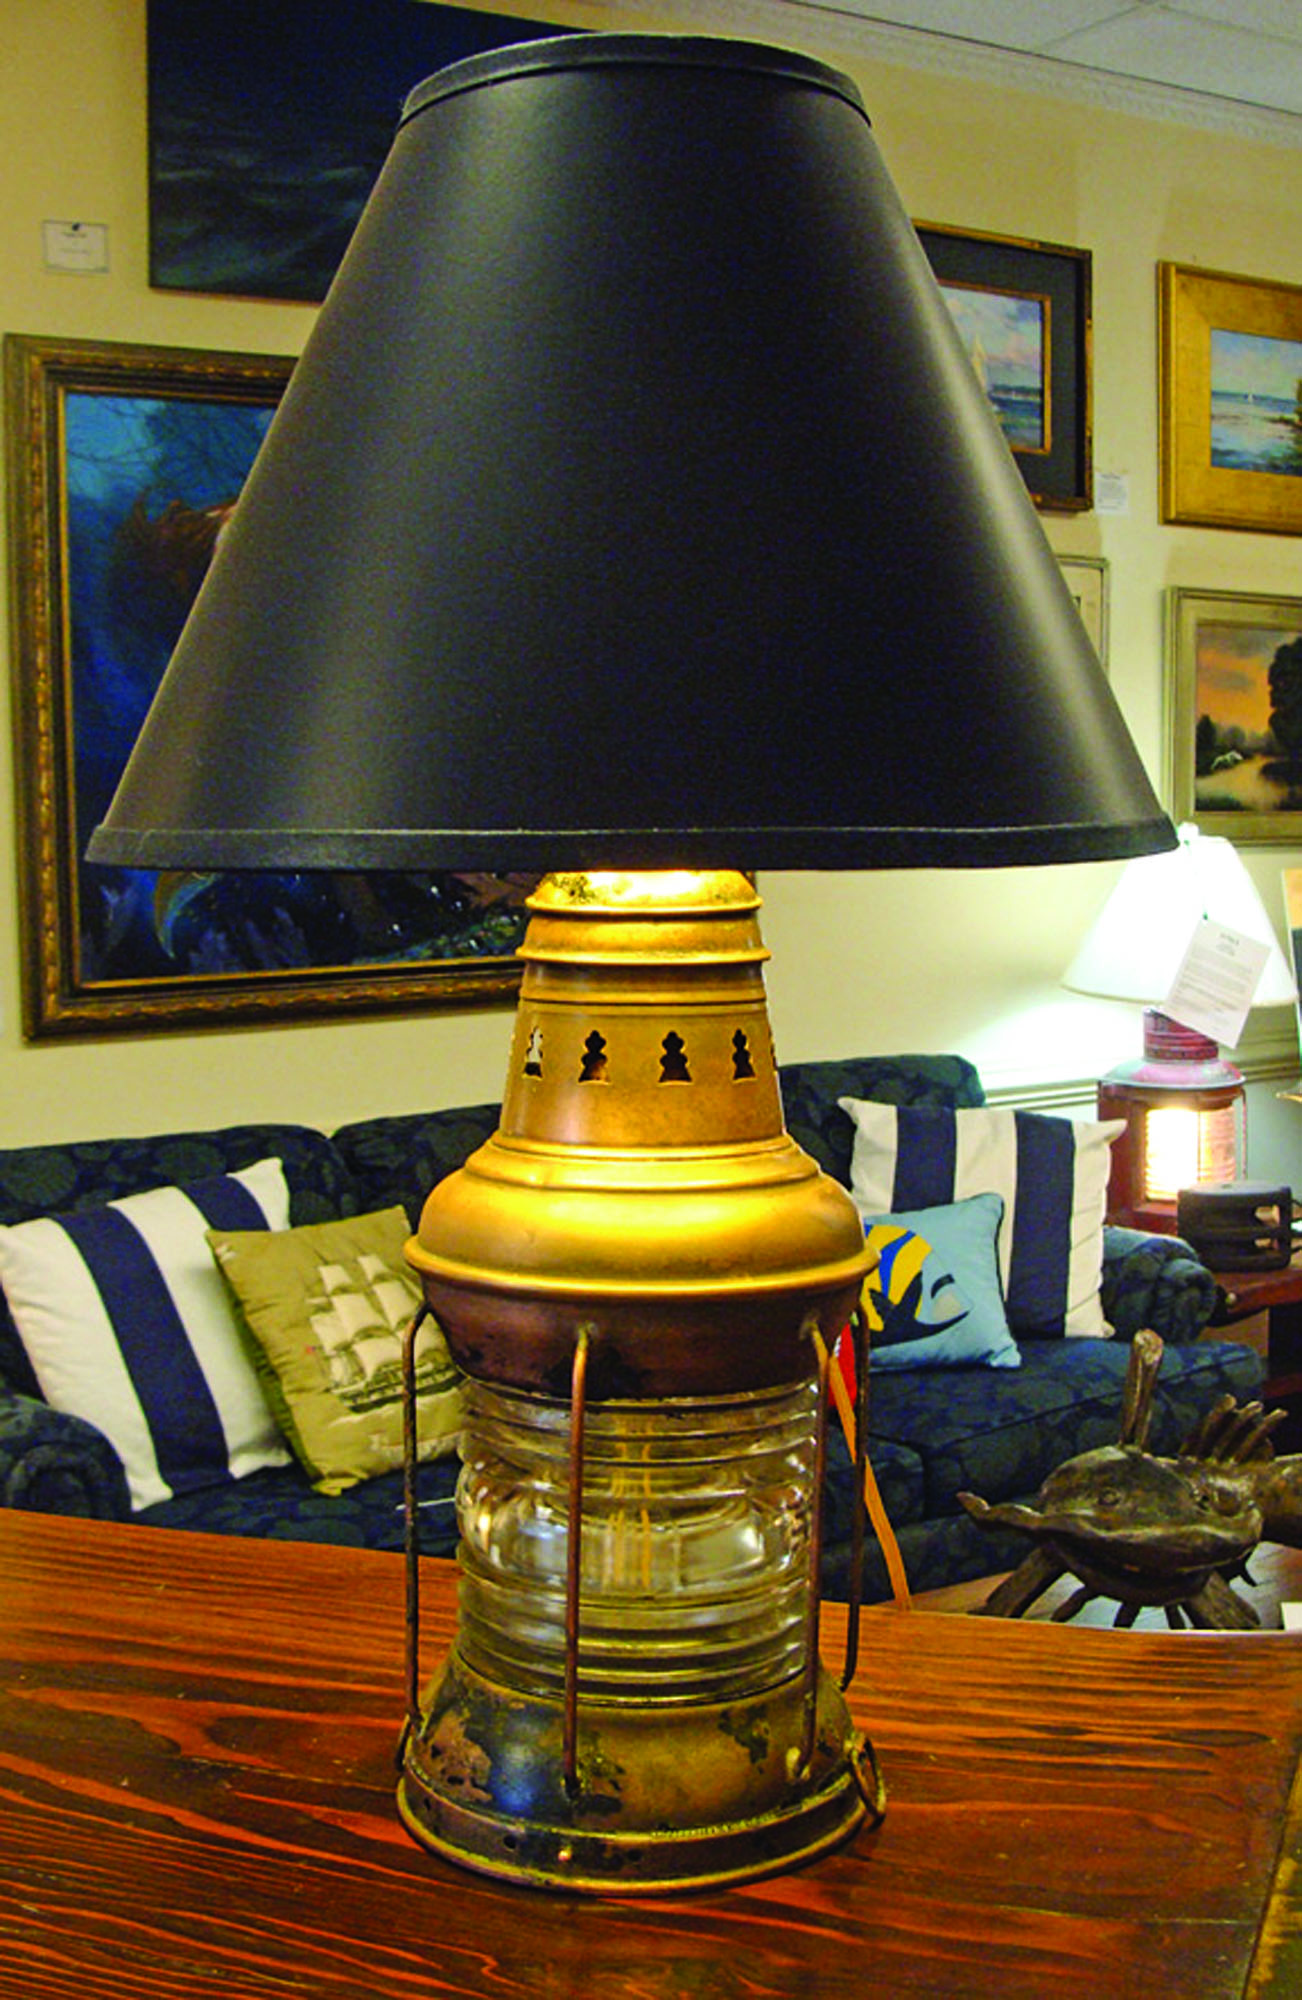 Nautical Lights Ahoy - Old House Journal Magazine